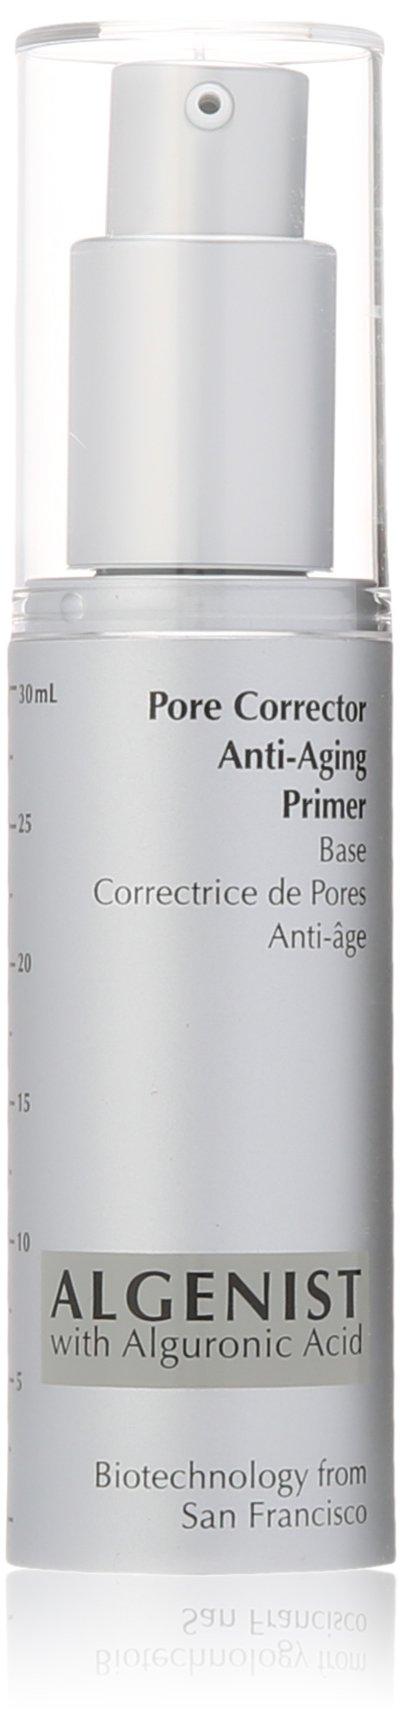 Algenist Pore Corrector Anti-Aging Primer Women, 1 Ounce